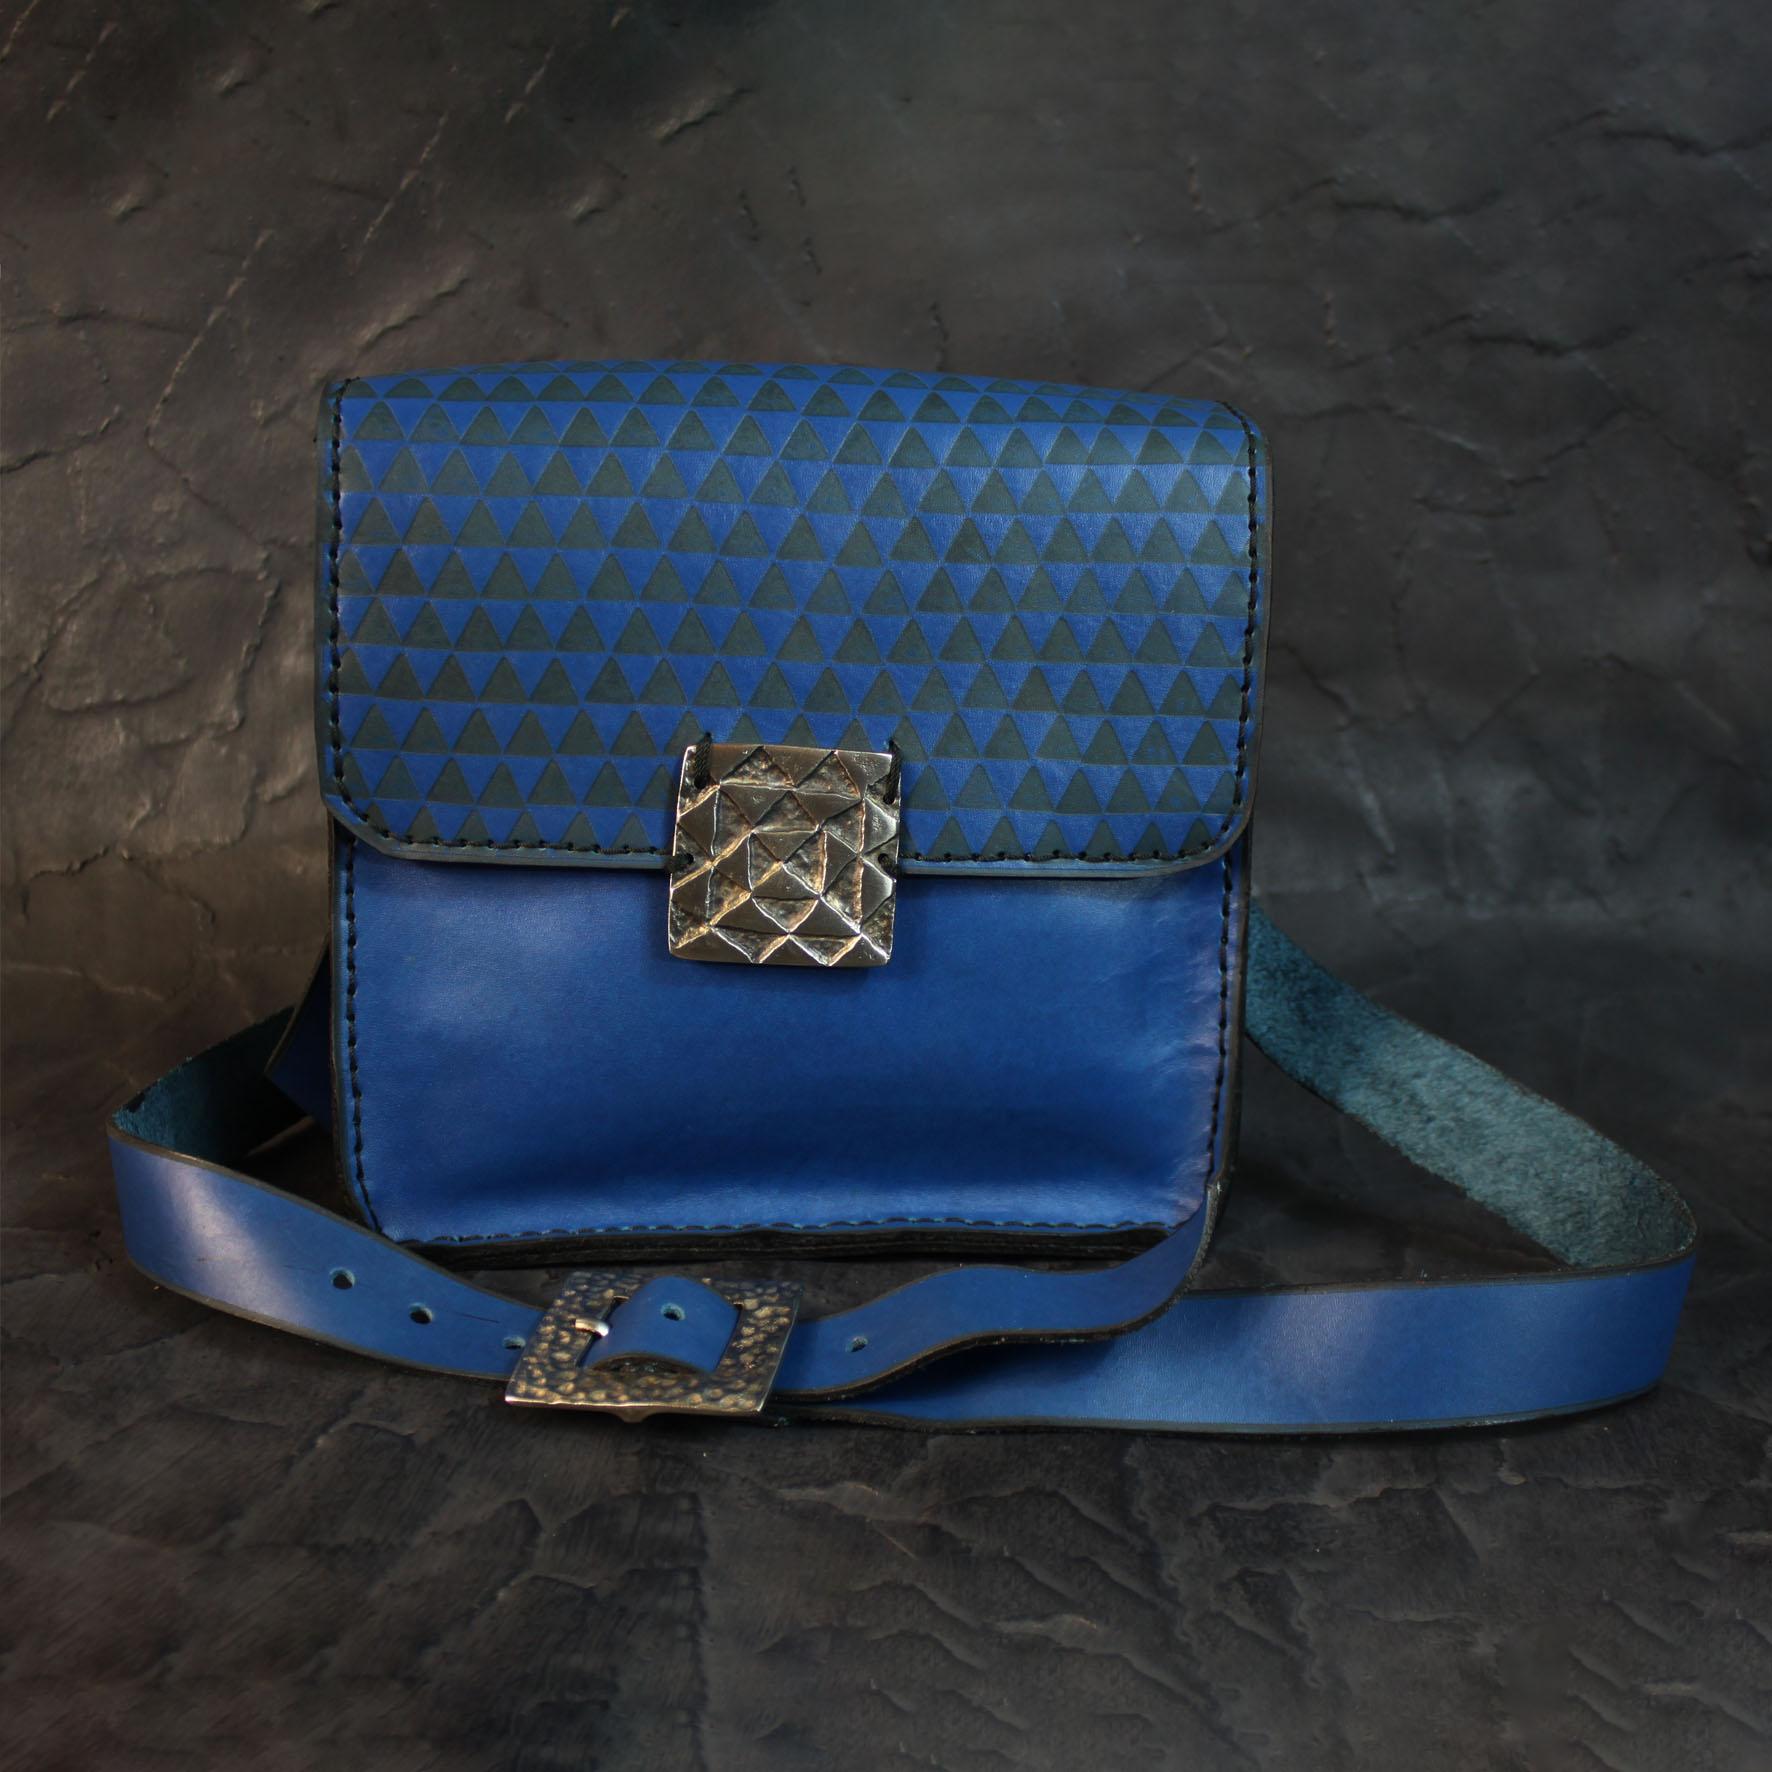 Small Square Bag